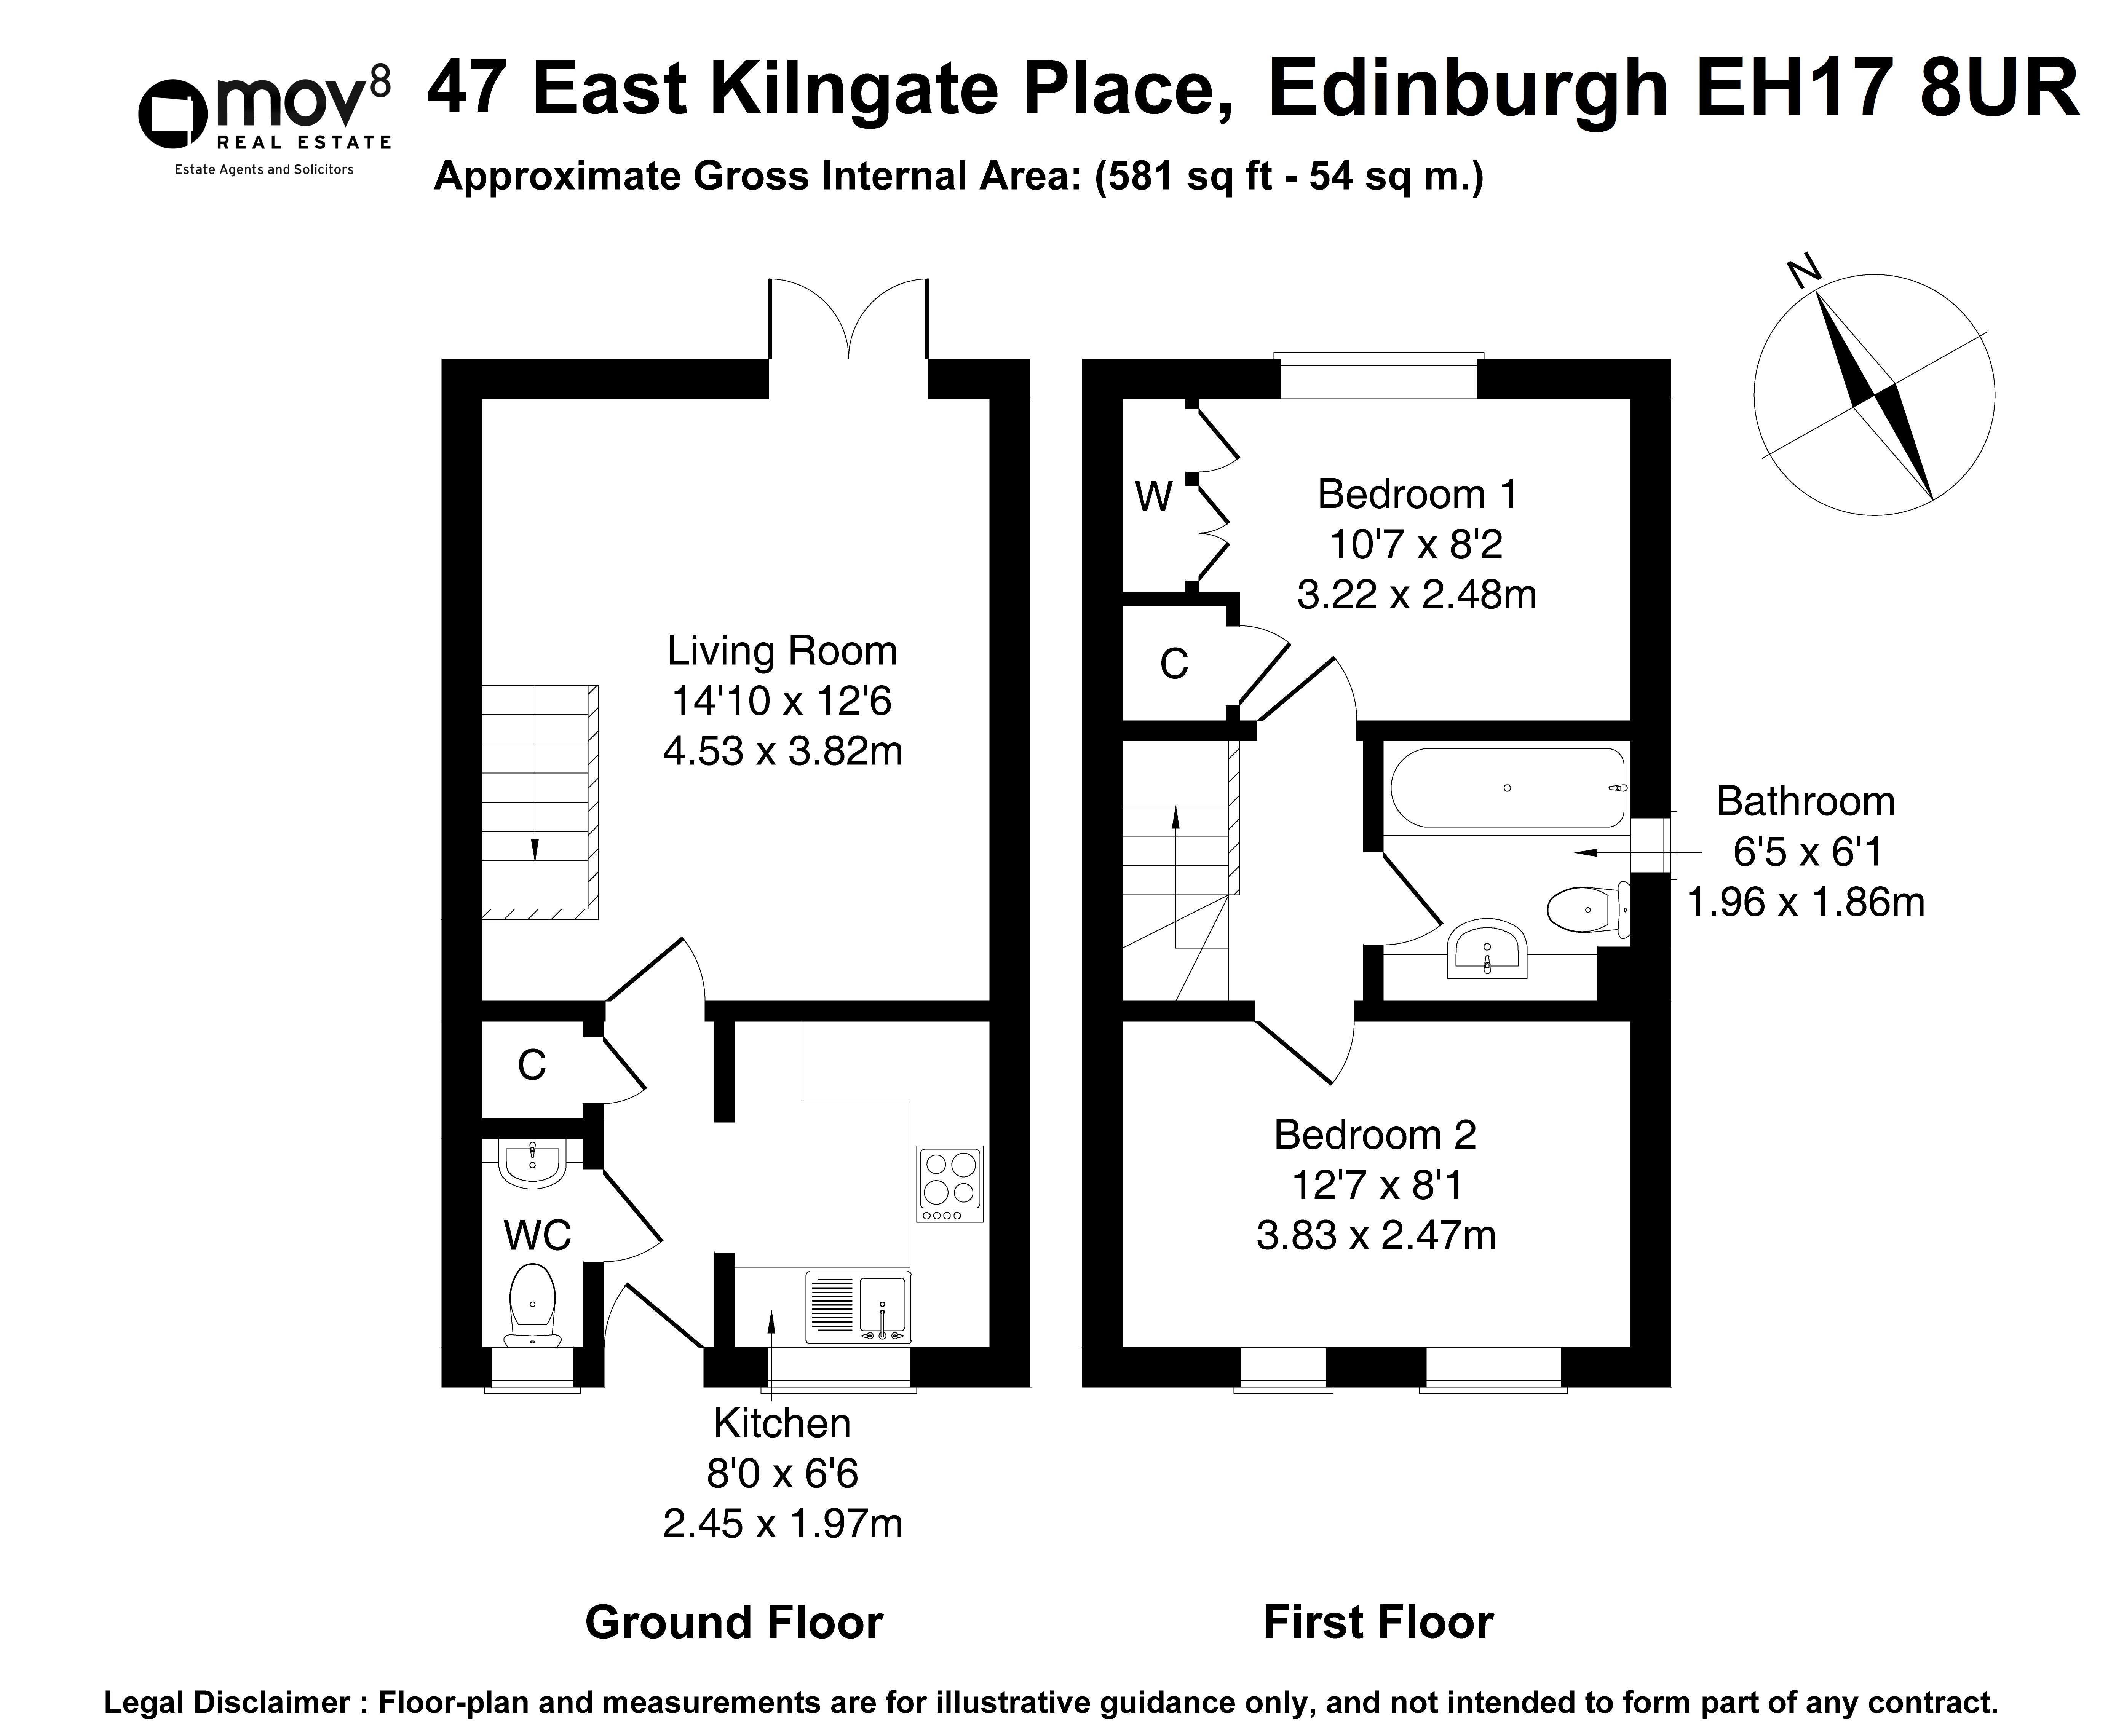 Floorplan 1 of 47 East Kilngate Place, Gilmerton, Edinburgh, EH17 8UR